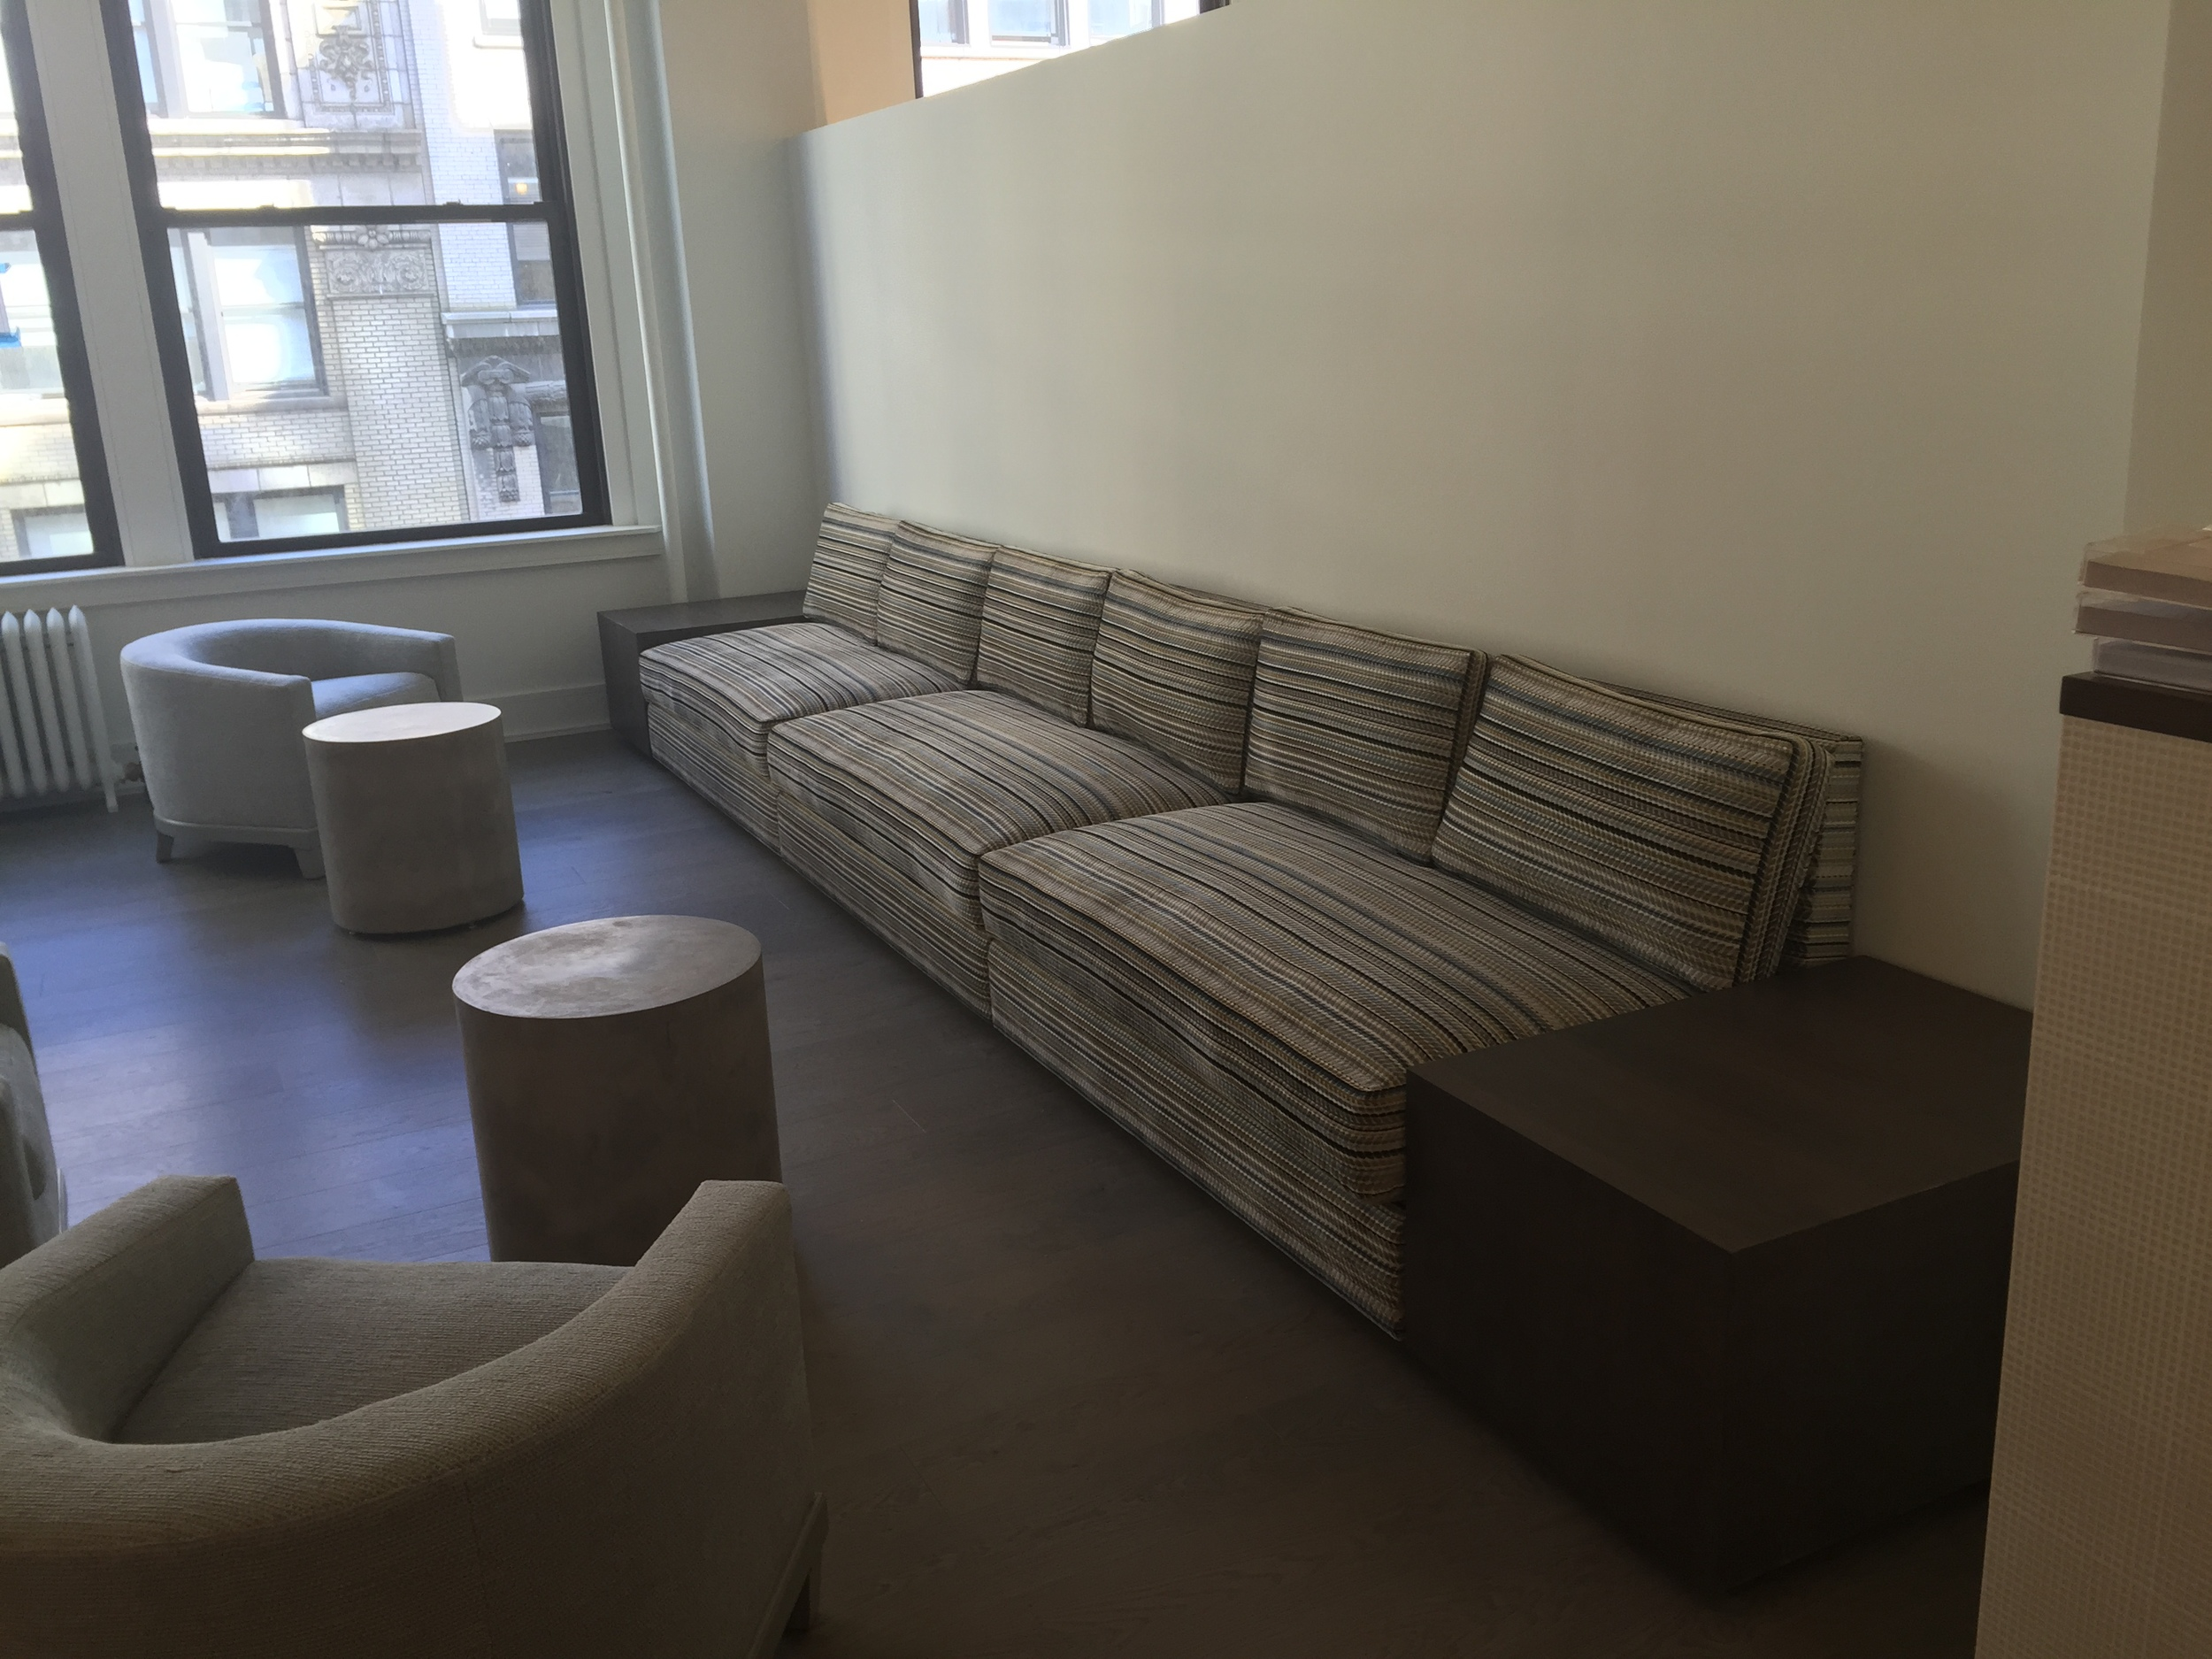 Upholstery by TLC Design, Pine Plains NY  Design by Huniford Design Studios, New York NY